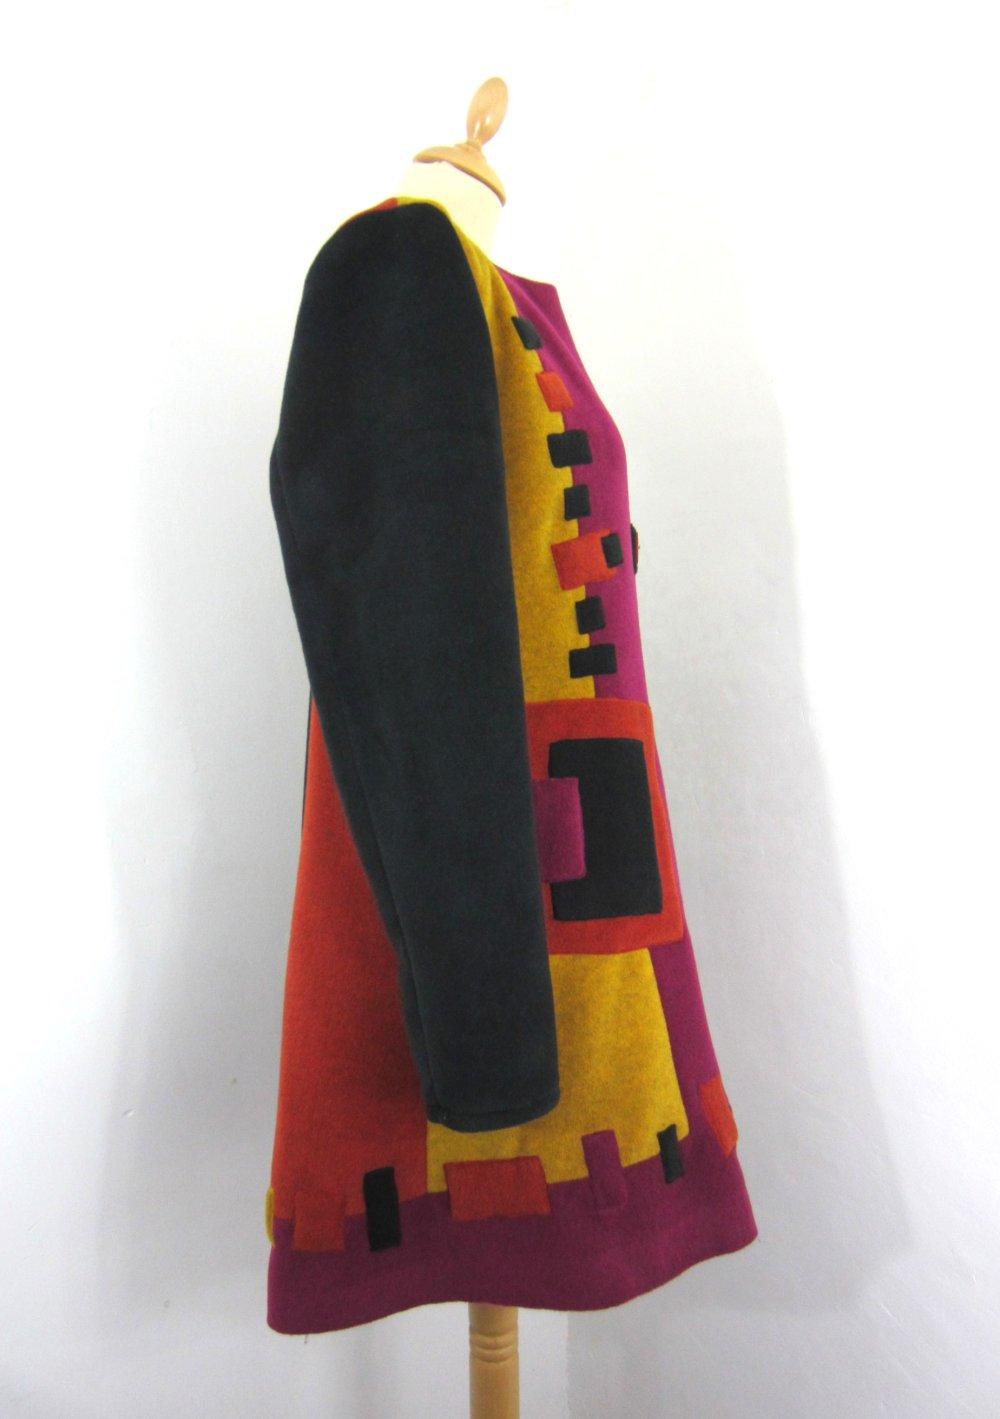 Veste M polaire oekotex multicolore Made in France